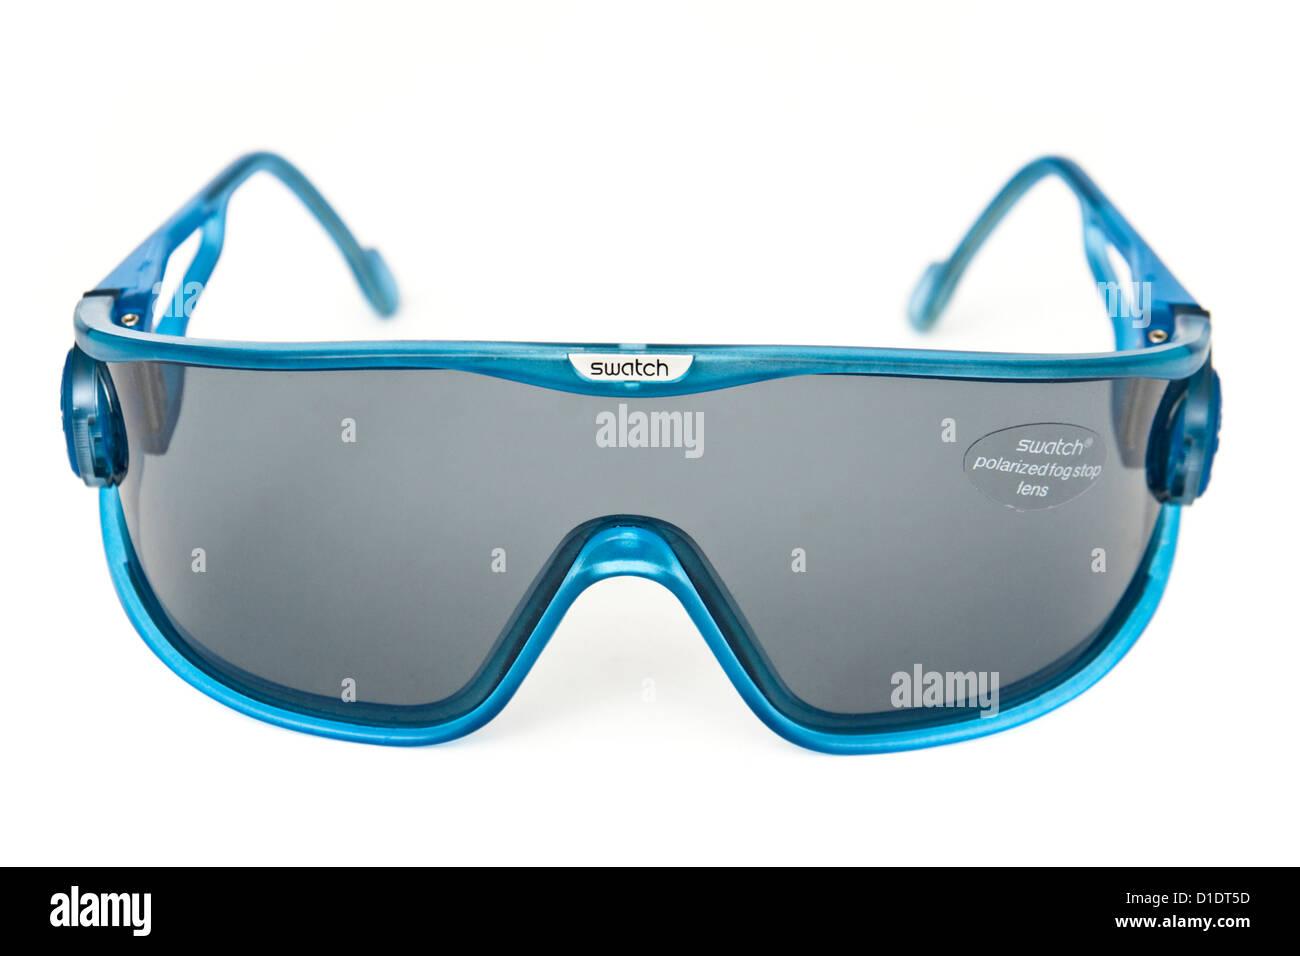 Swatch designer ski goggles / sunglasses with polarized fog-stop lenses and tilting frame adjustment - Stock Image